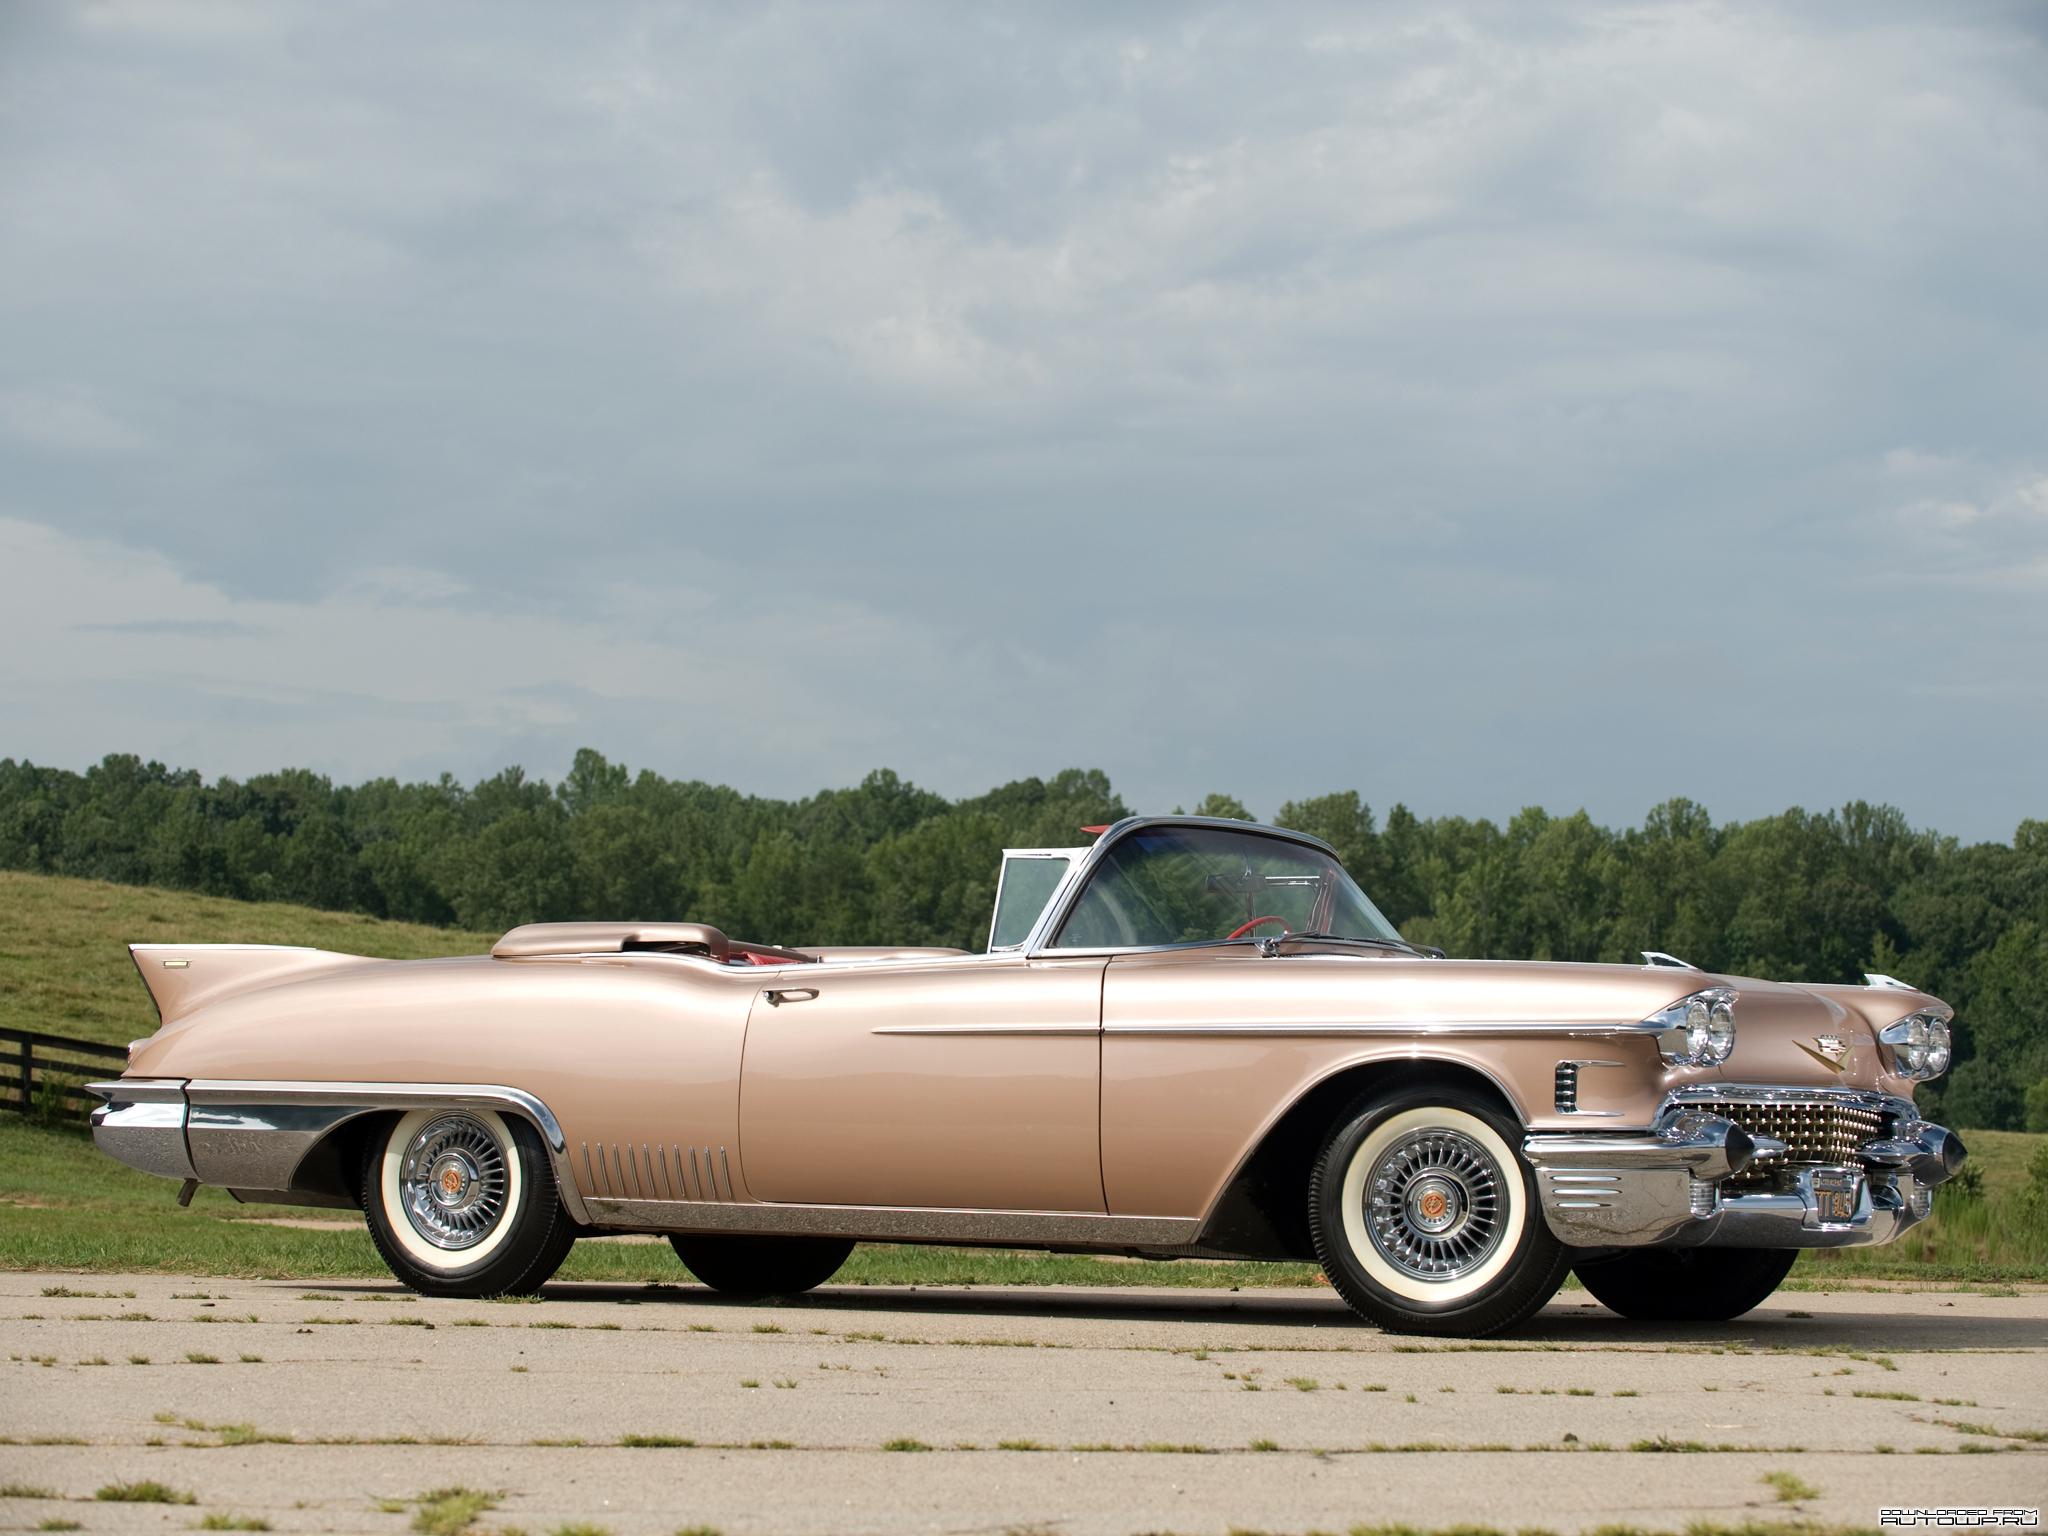 1958 Cadillac Eldorado Biarritz Backgrounds on Wallpapers Vista